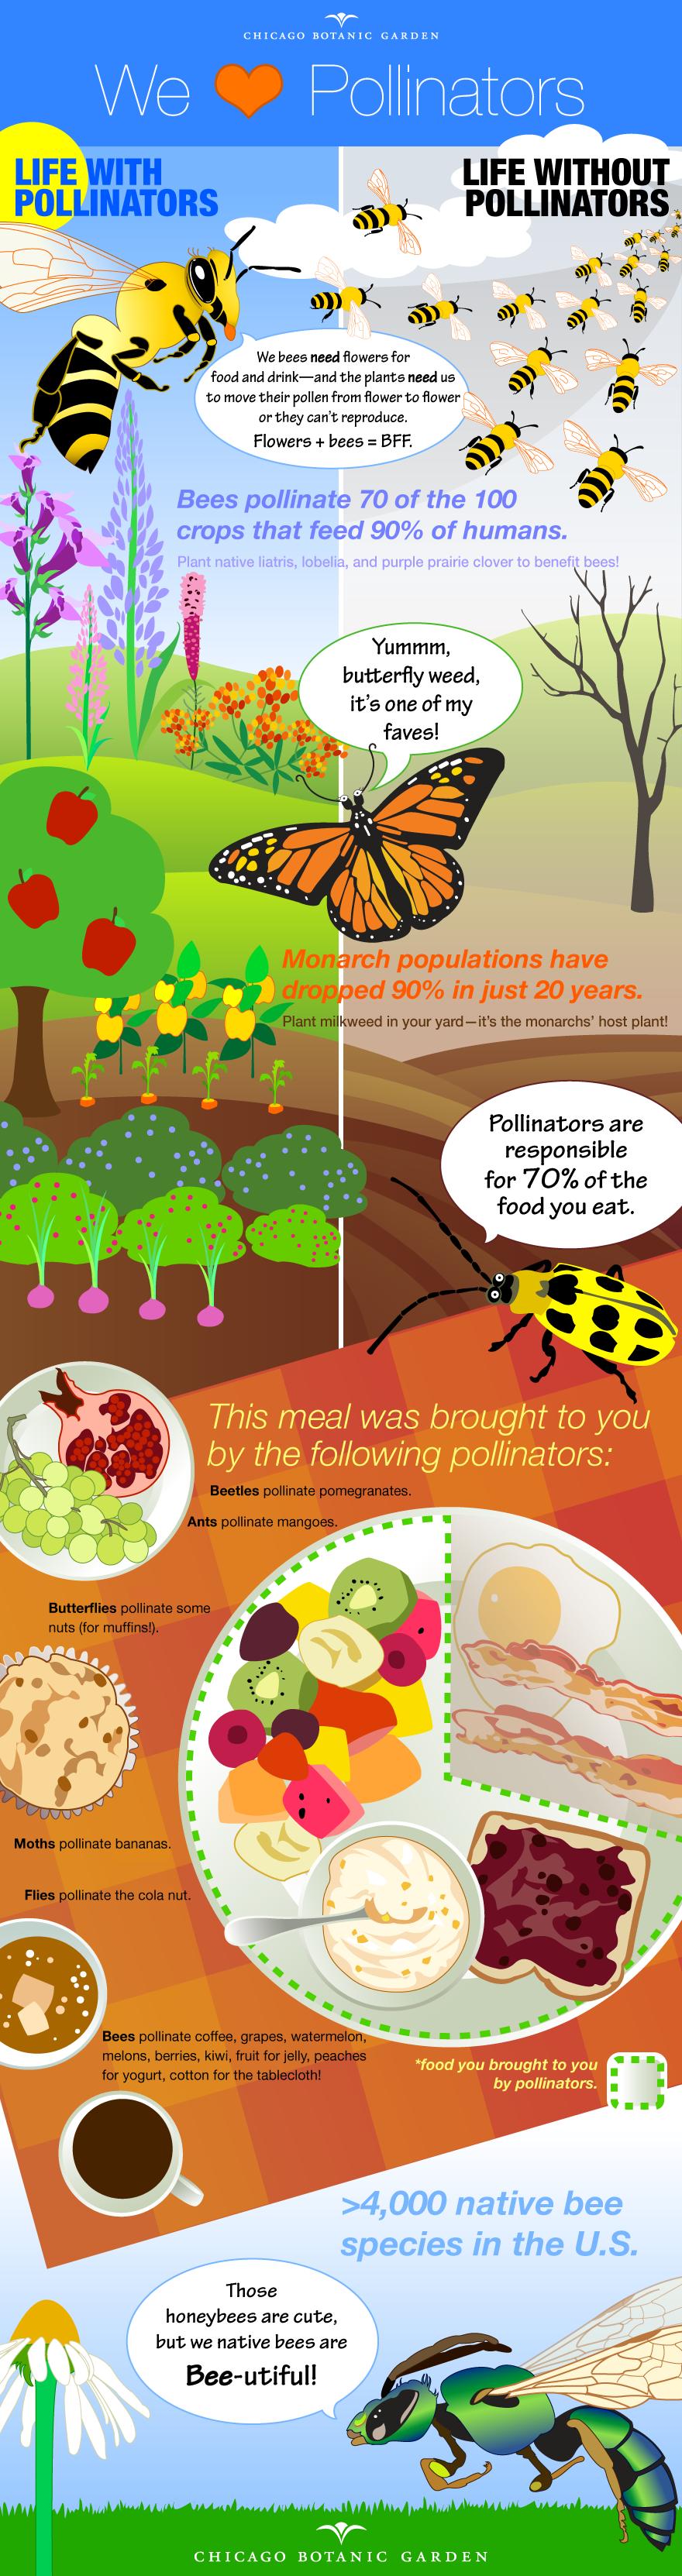 PHOTO: Pollinator infographic.